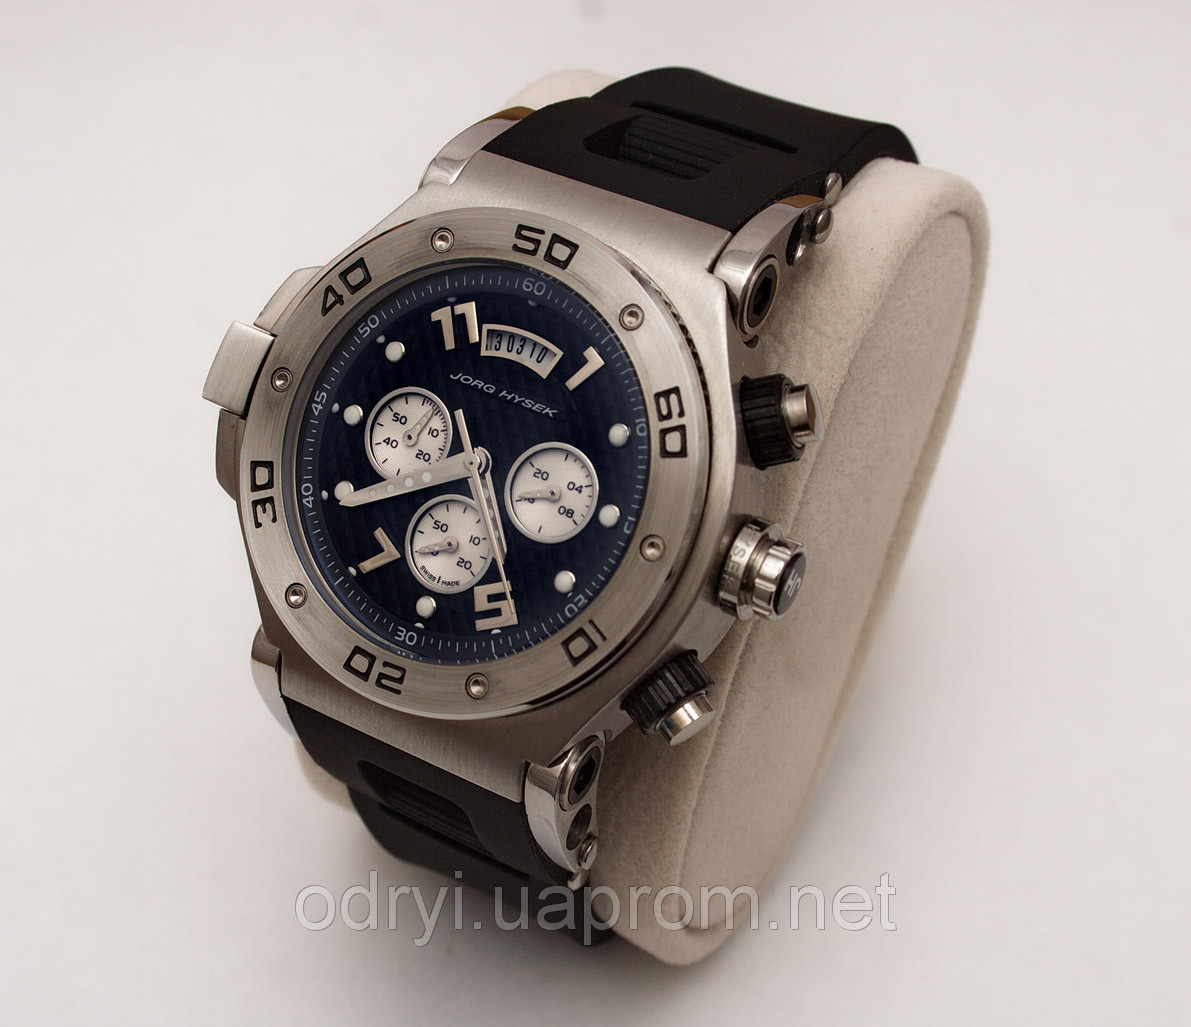 Наручные часы abyss купить женские часы наручные в белом корпусе